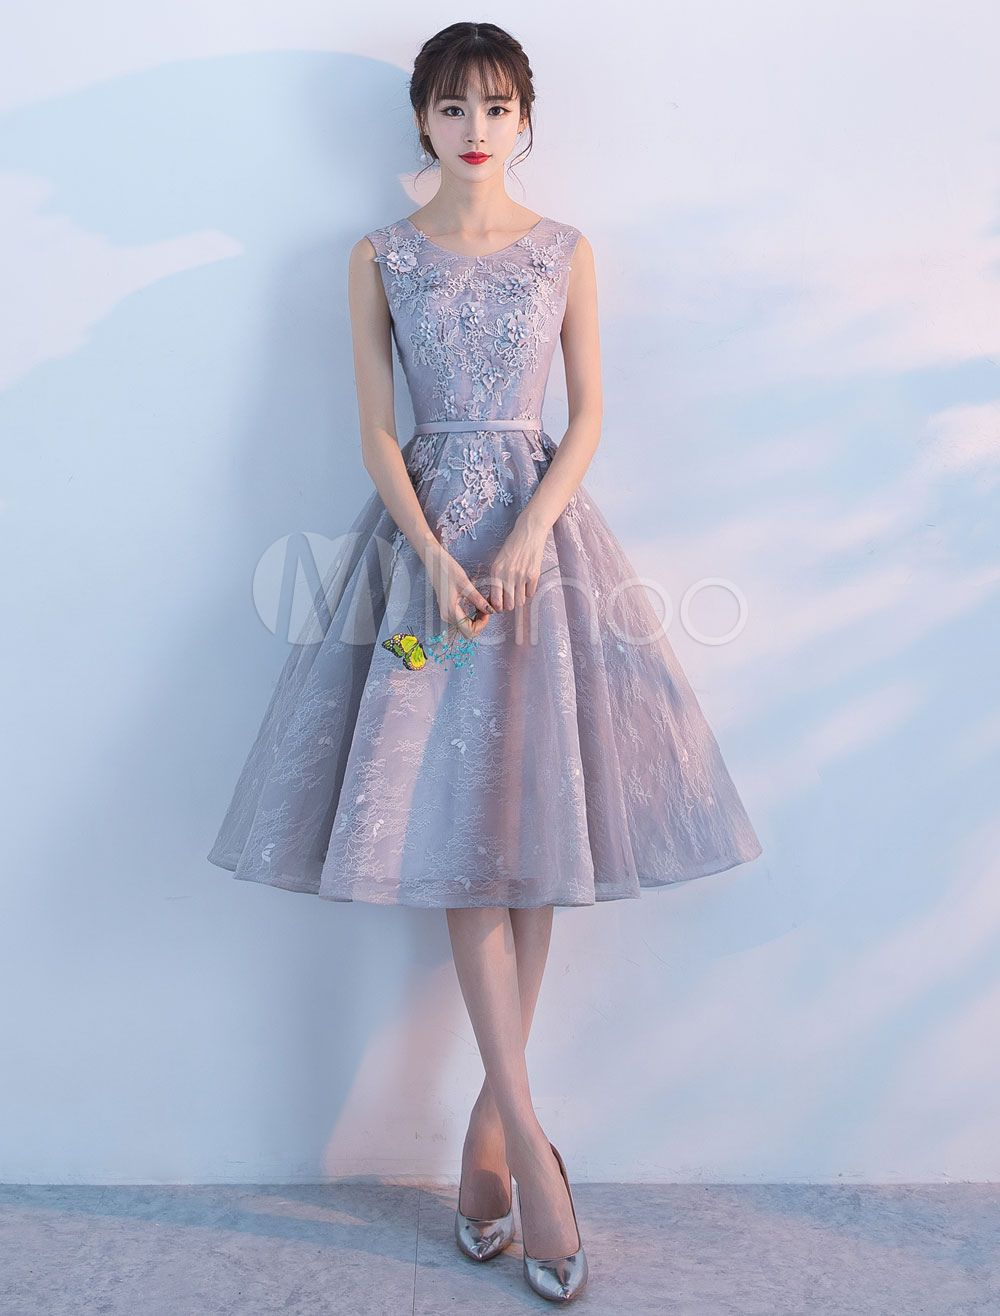 ca270f7db18 Lace Homecoming Dresses Short Light Grey Cocktail Dresses Knee Length  Sleeveless Graduation Dress